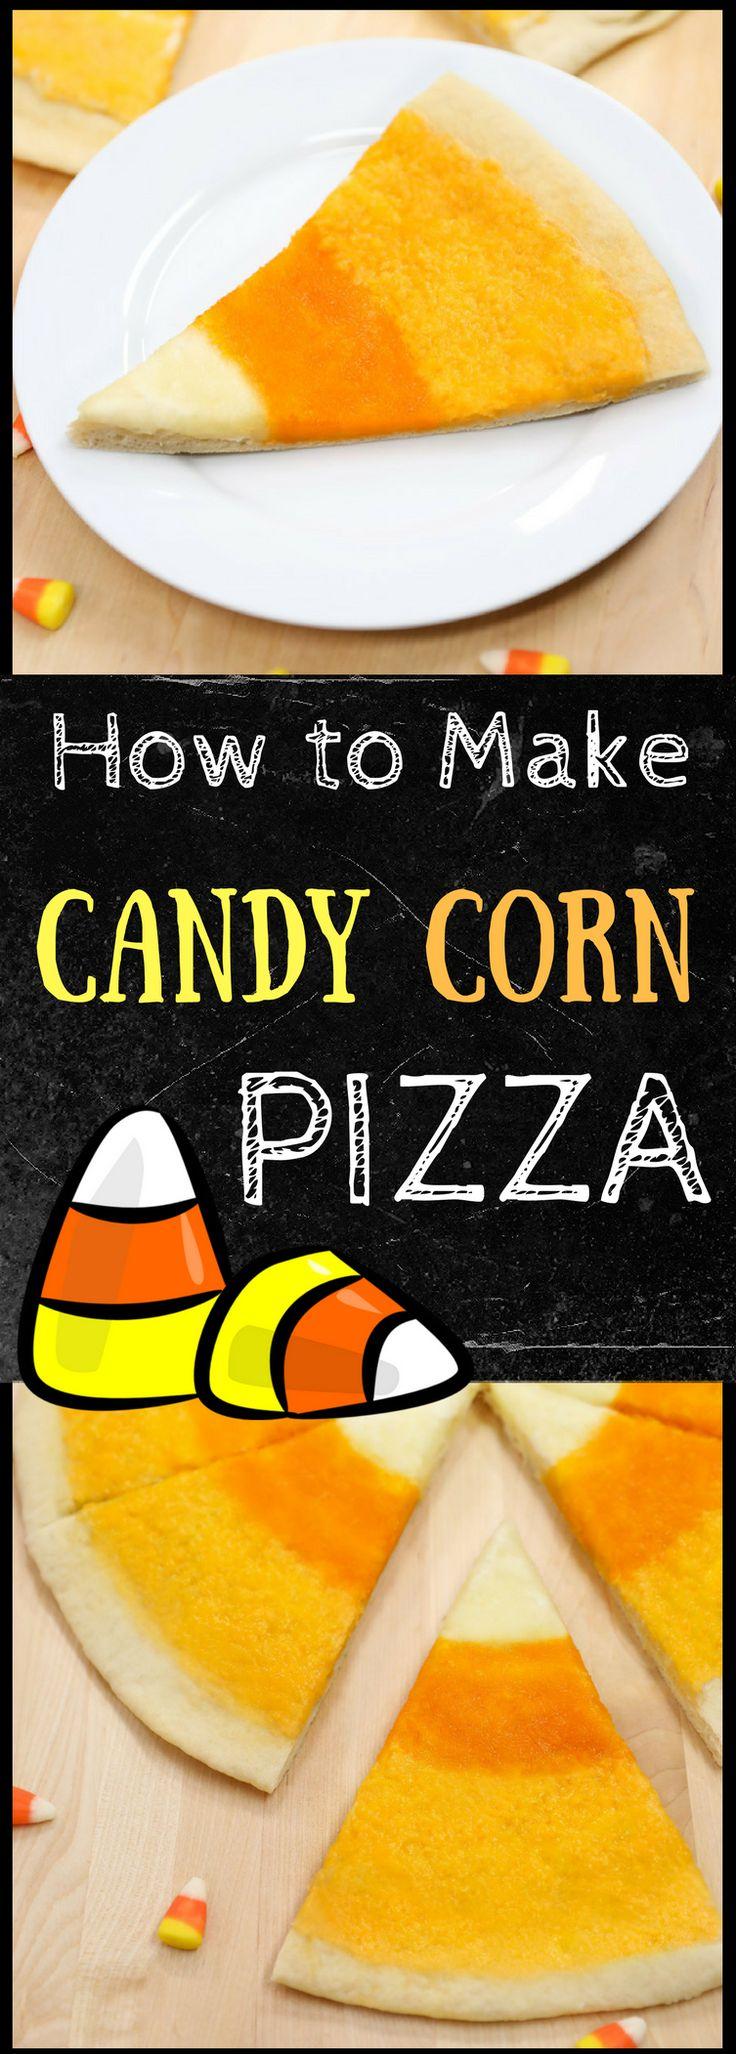 Candy Corn Pizza Recipe: 3 Cheeses